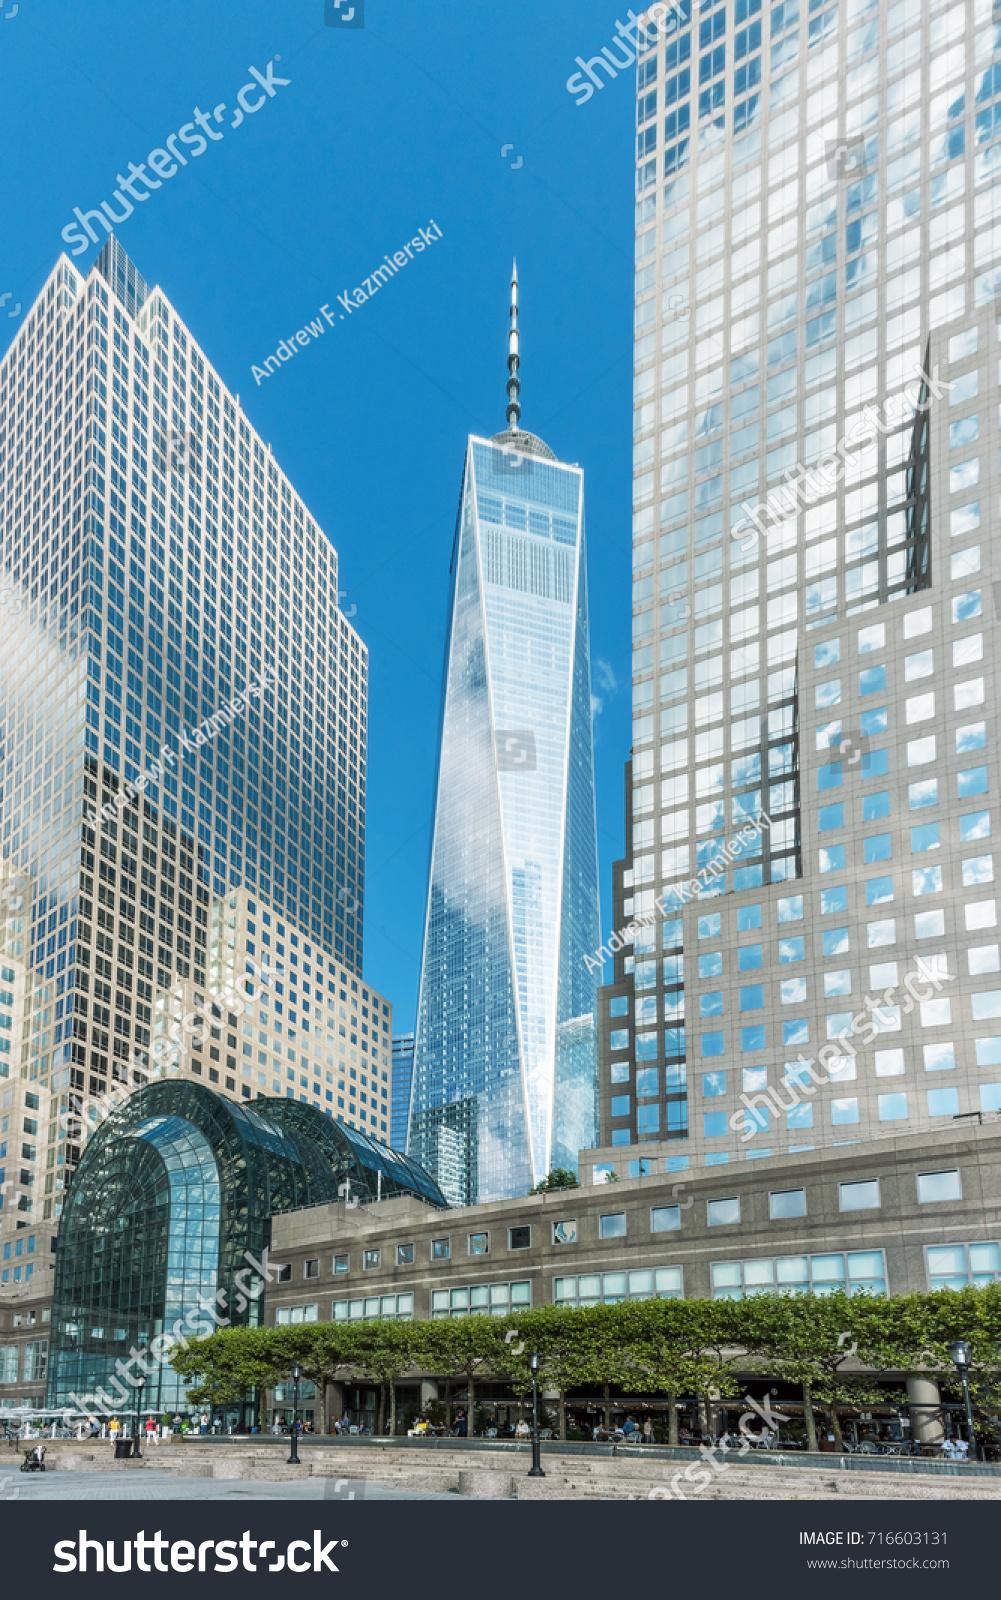 new york ny usa september 7 stock photo 716603131 shutterstock